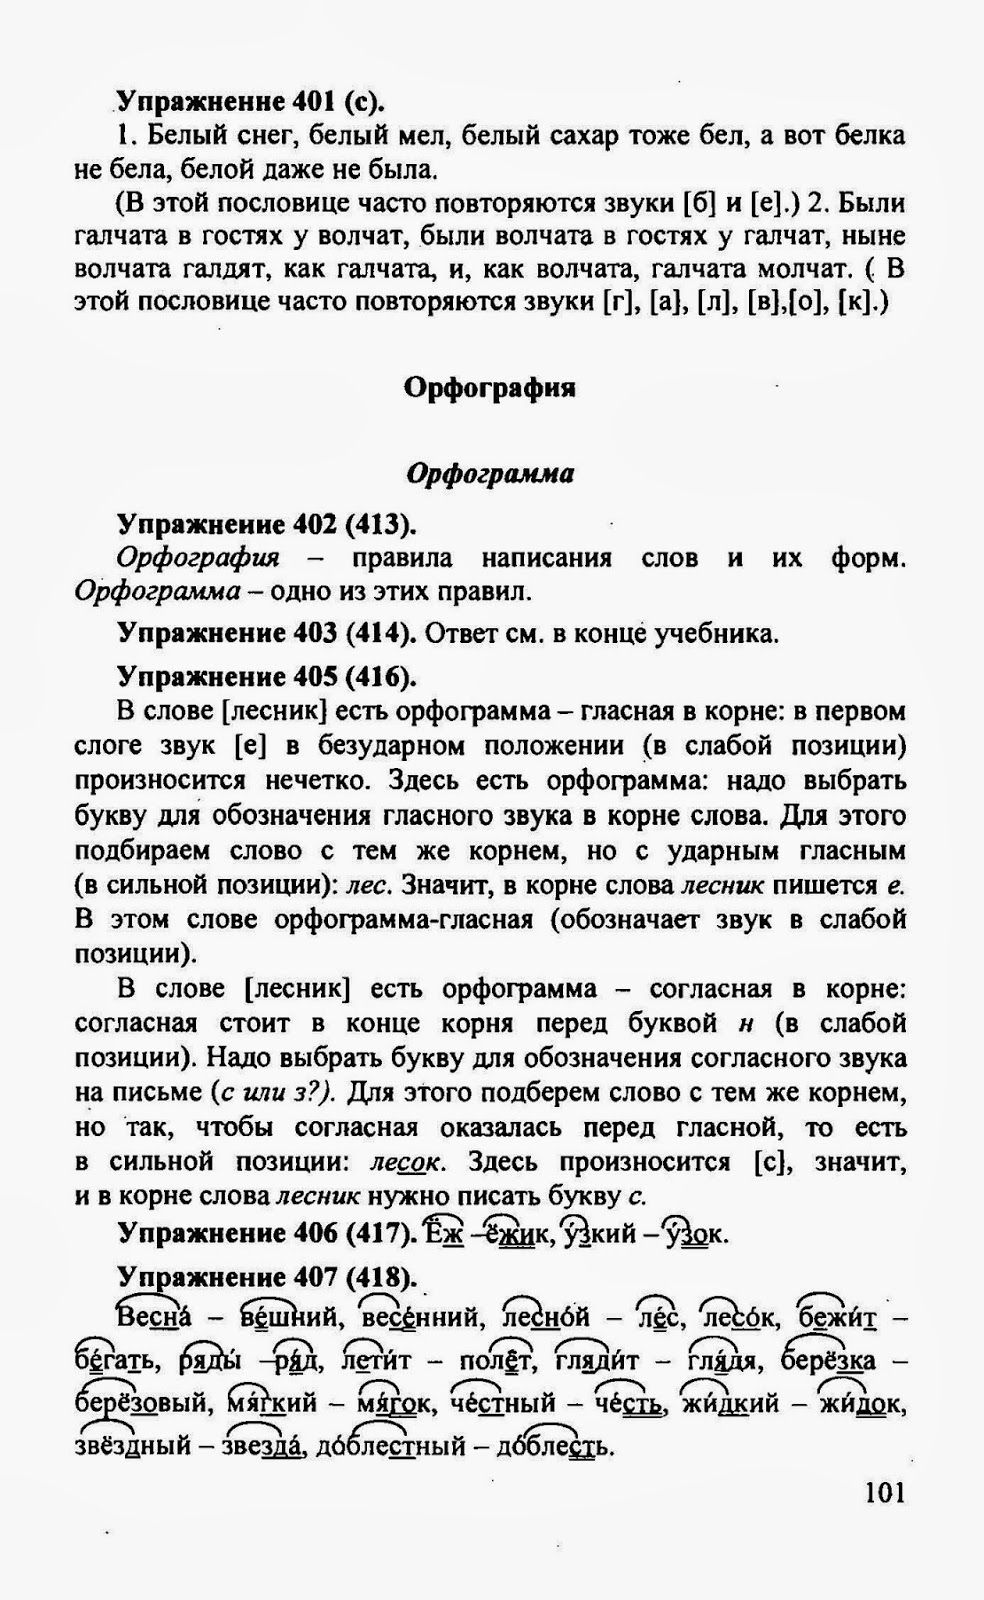 Ответ на задание 417 по математике за 4 класс книгам.в богданович